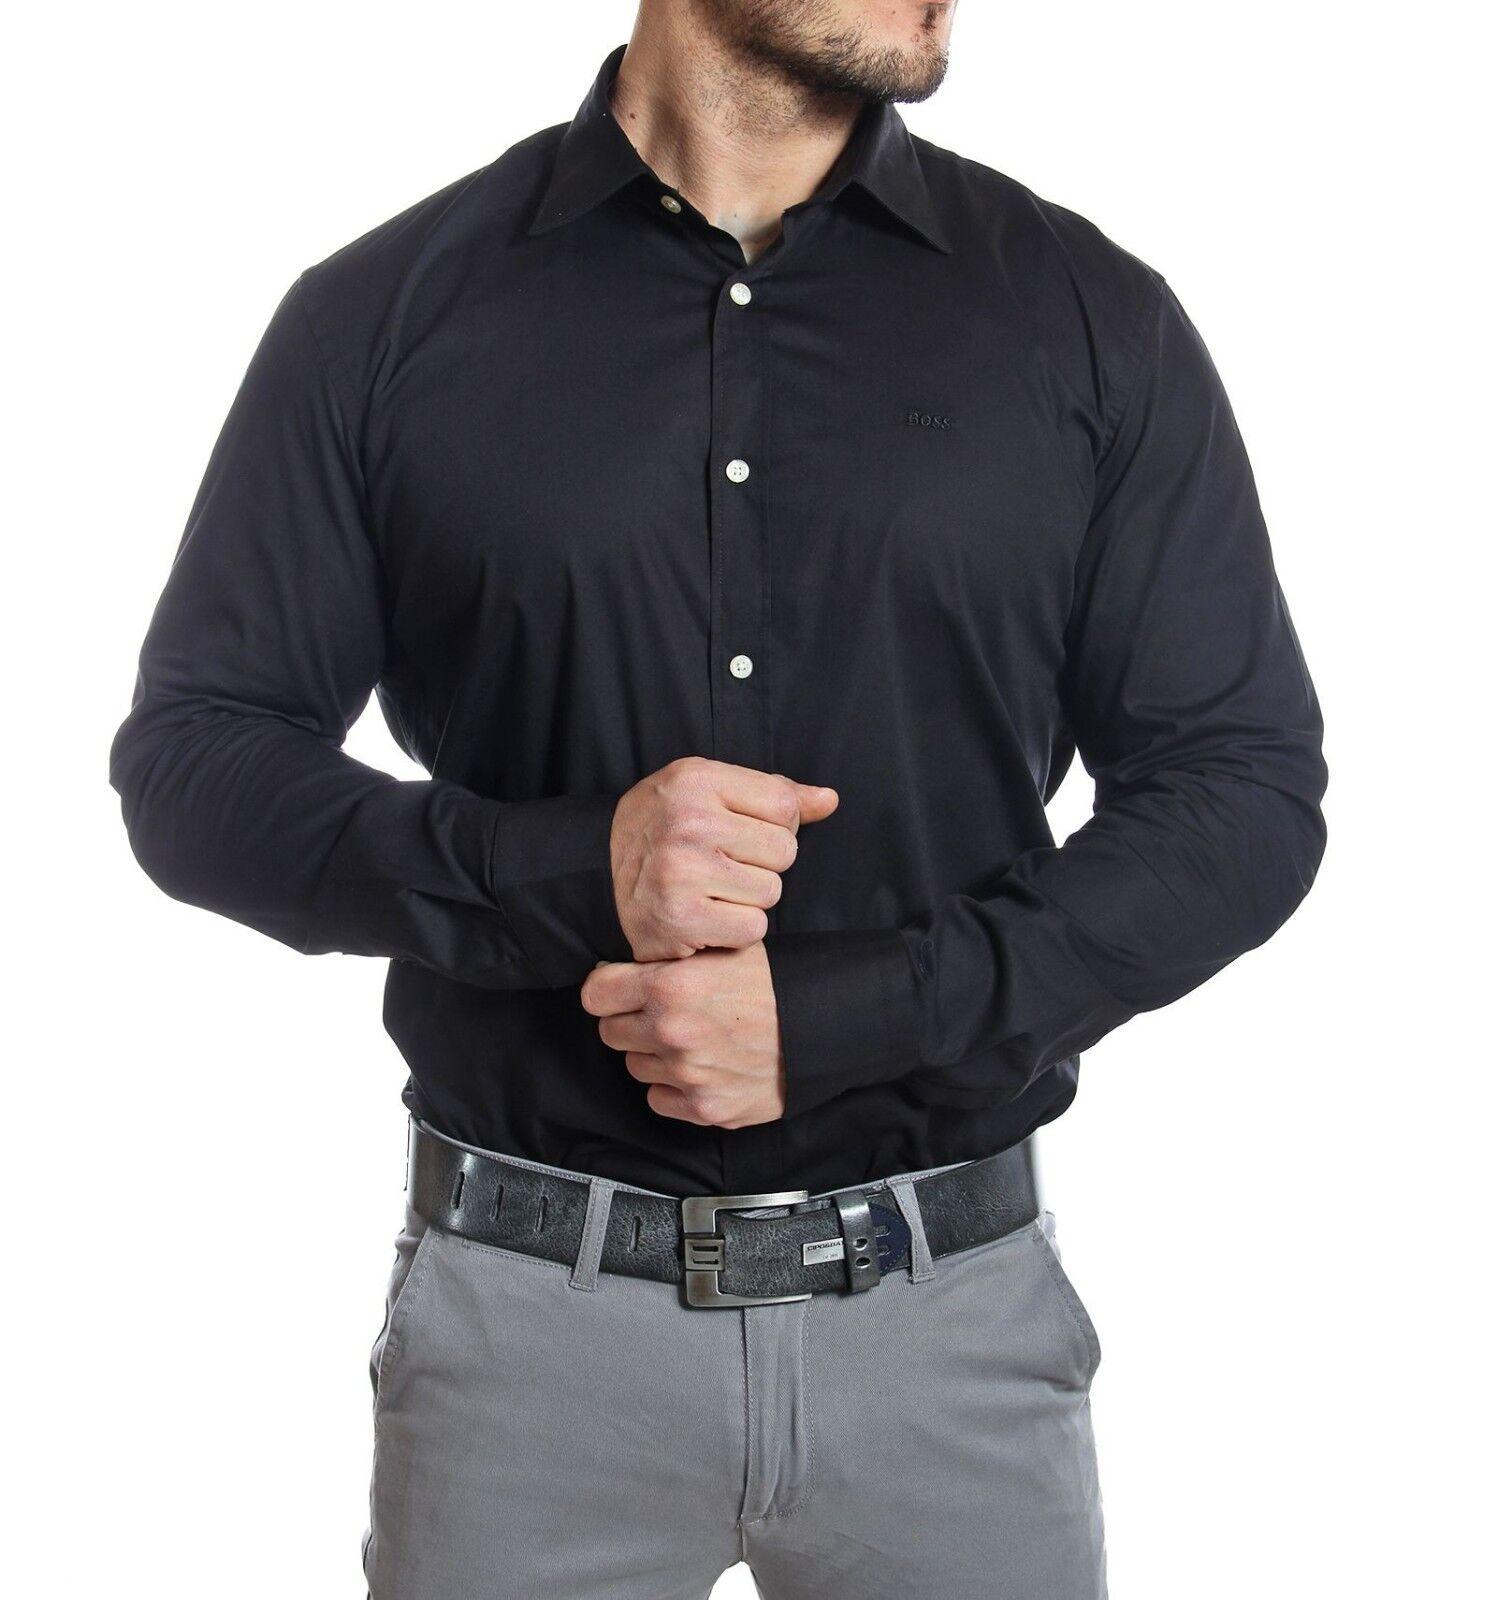 Black (Dress Shirt)